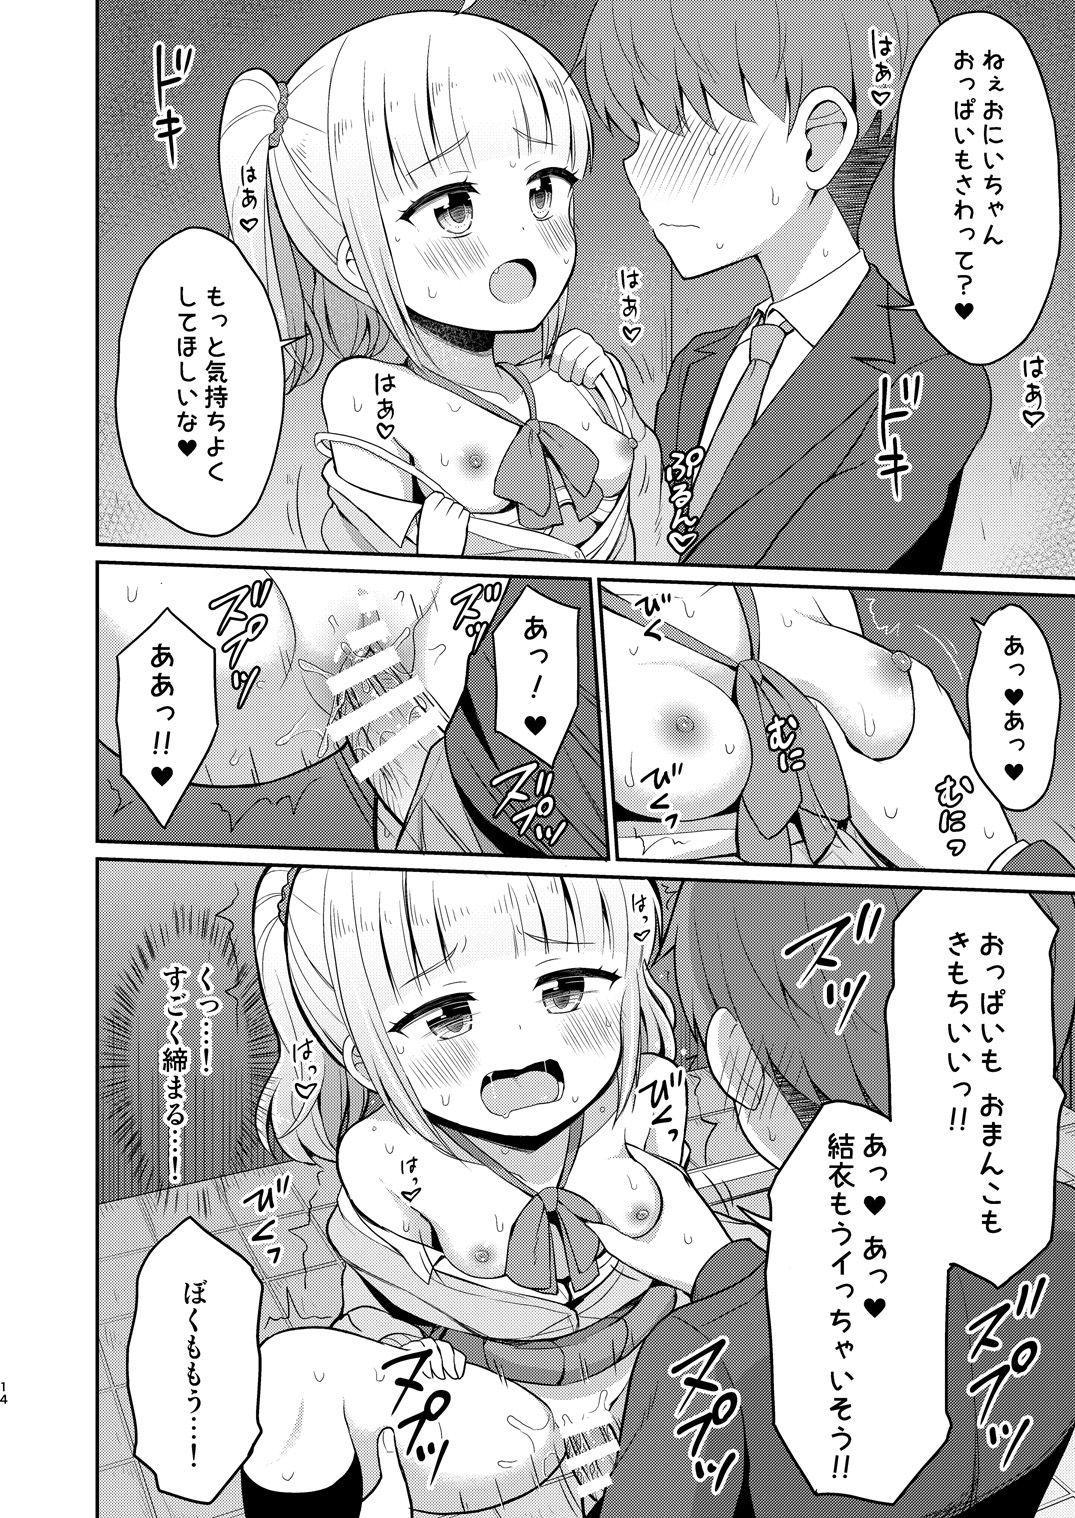 Onii-chan Daisuki H Shiyo 2 13